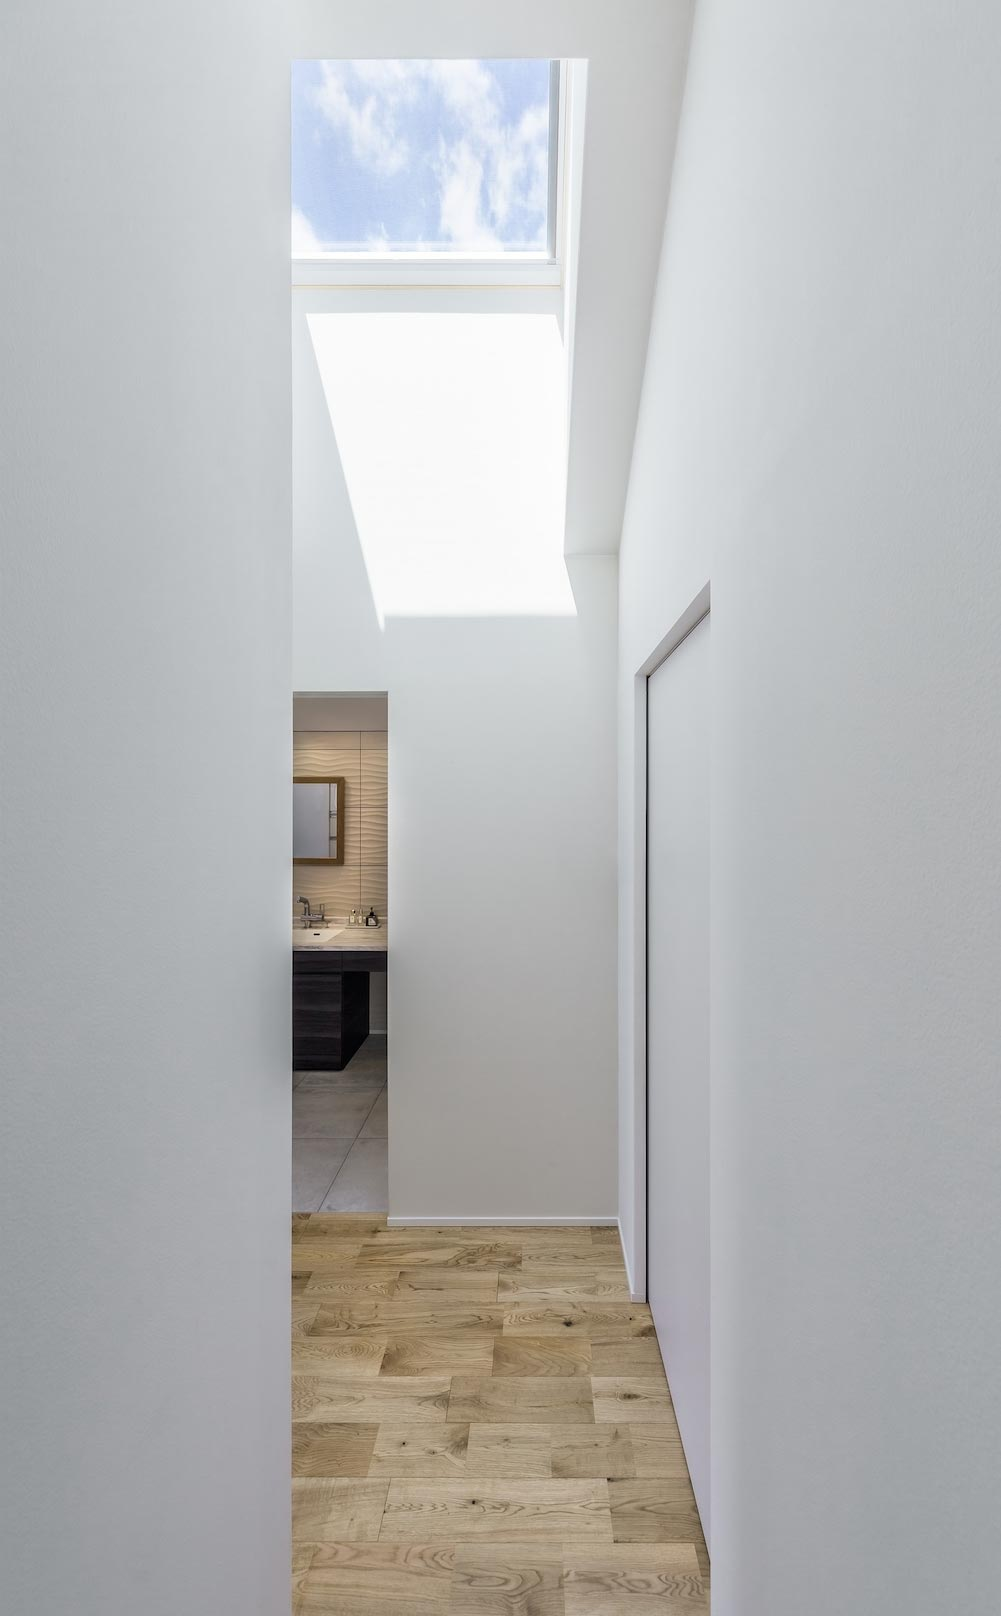 <p> 2F廊下から洗面脱衣室方面をみる: 白い壁とトップライトで明るい印象 </p>